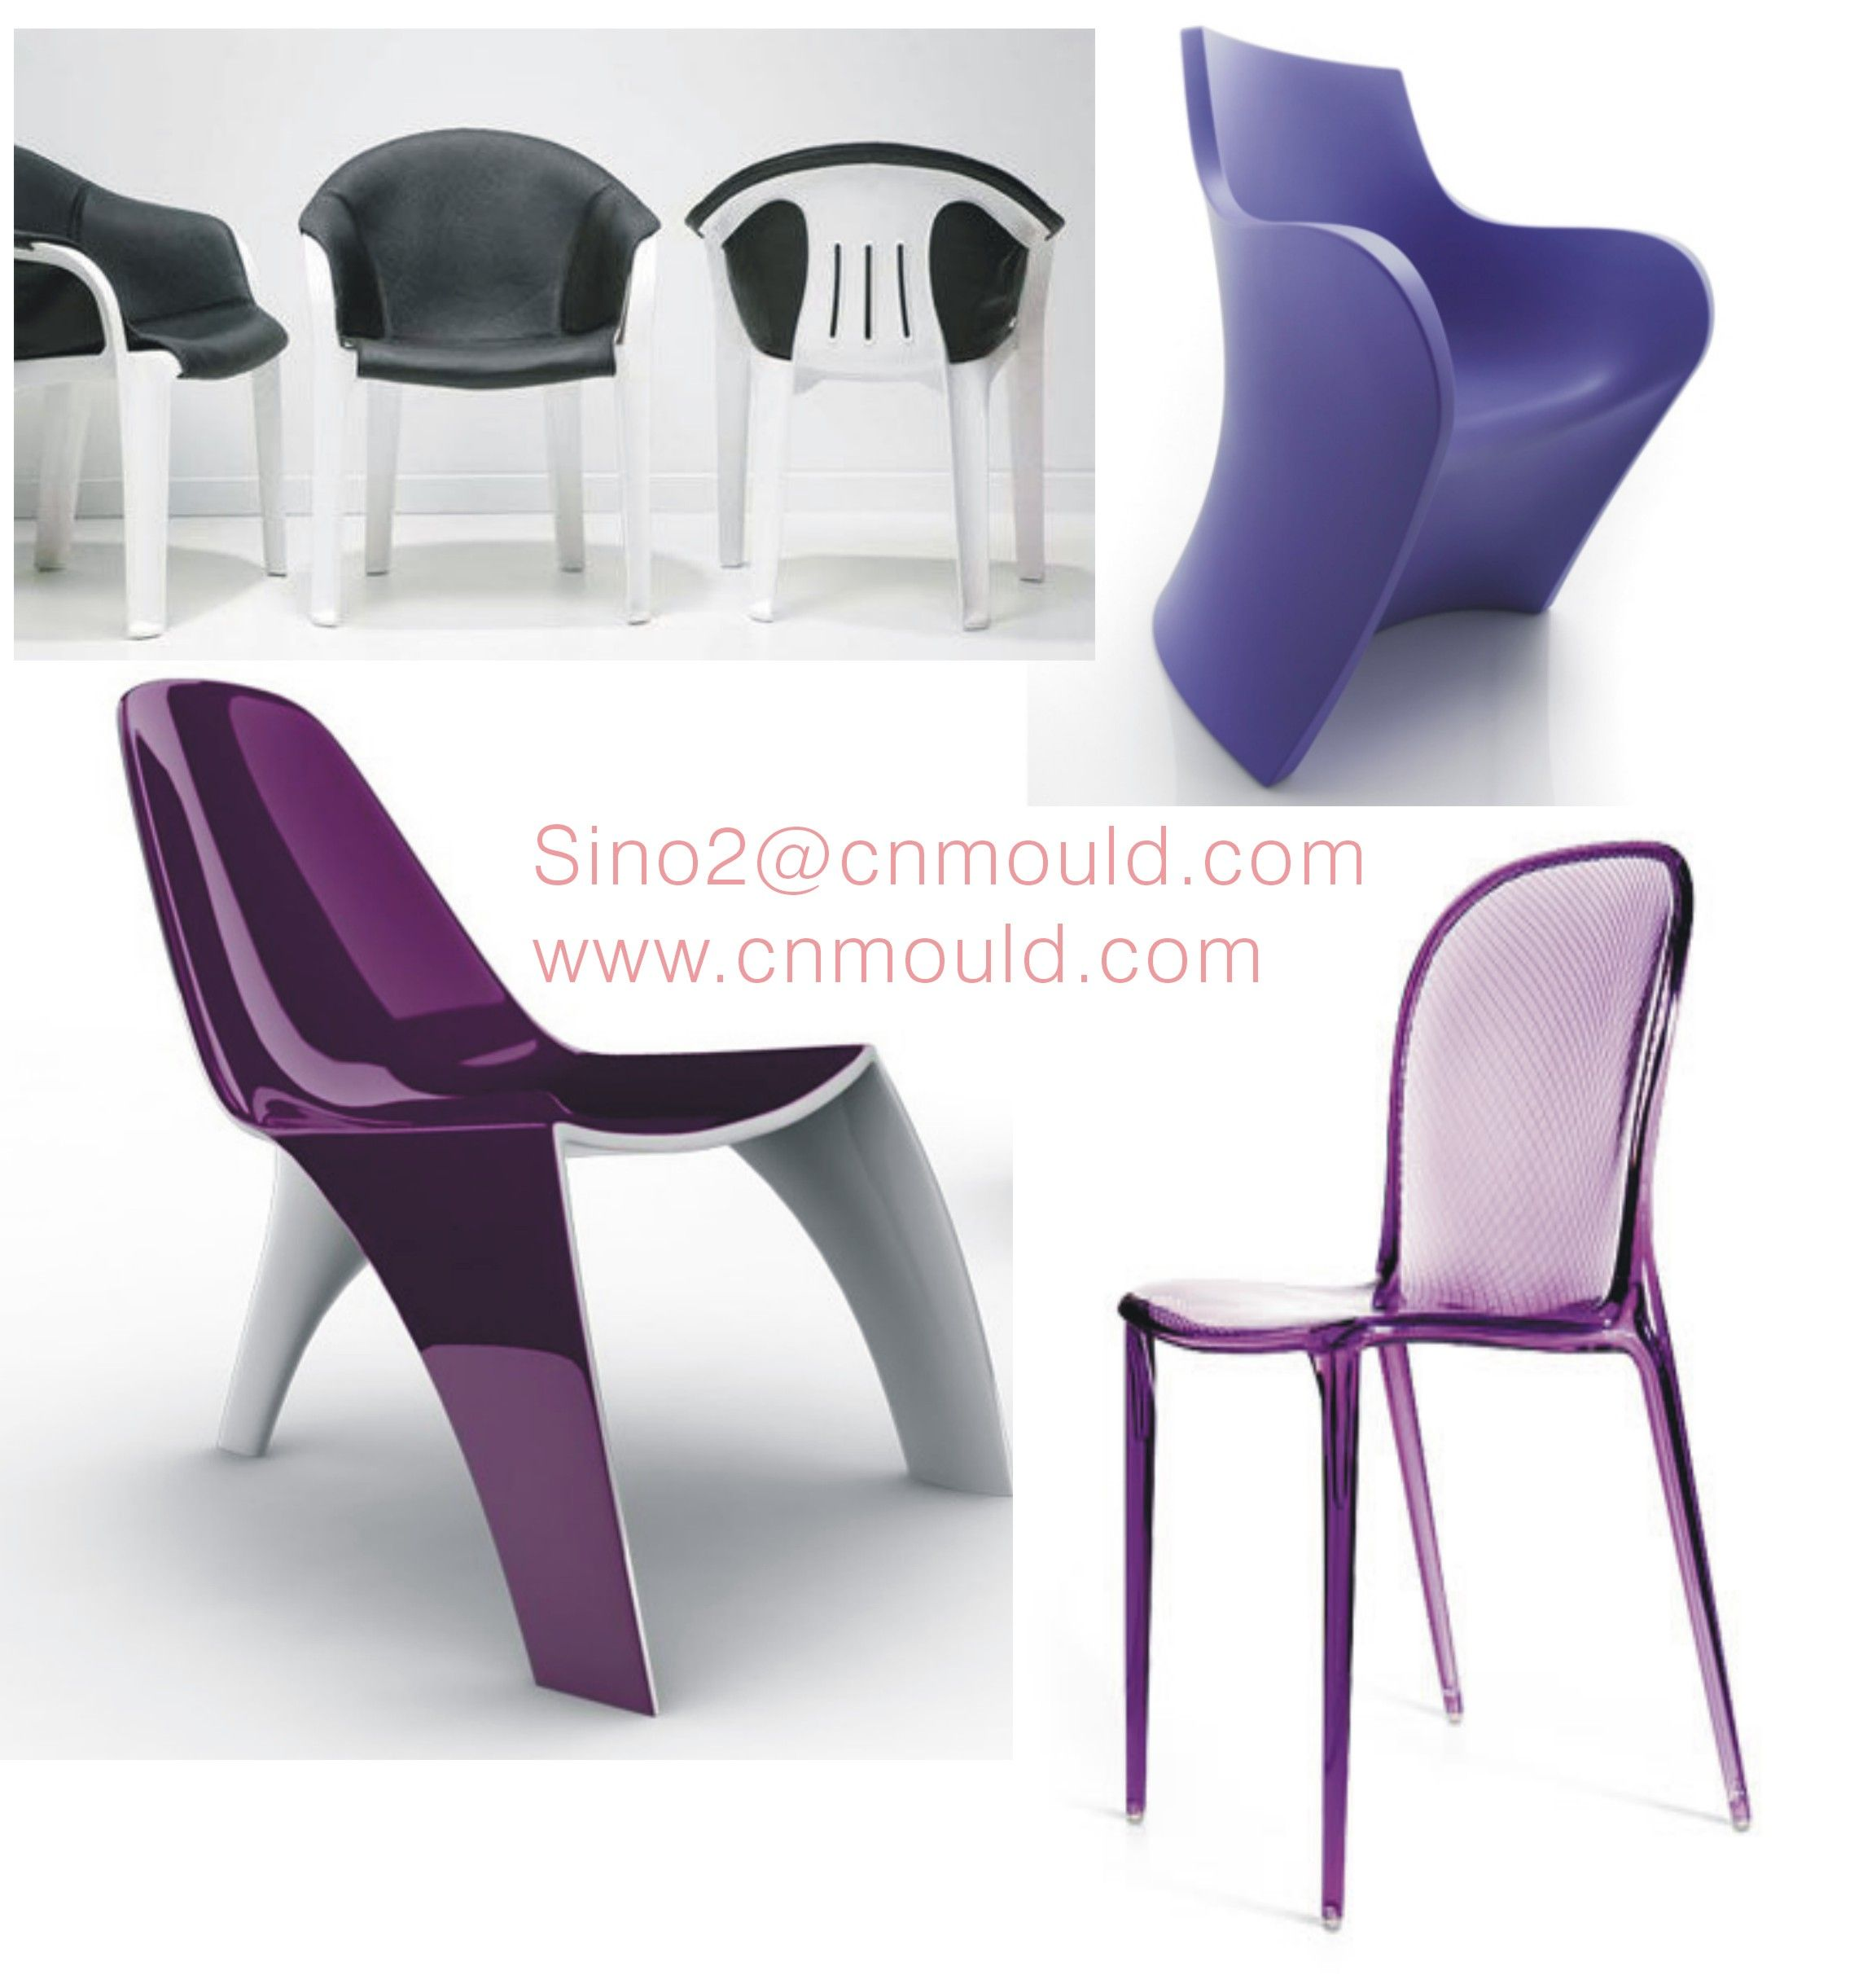 plastic chairs - Plastic Chair